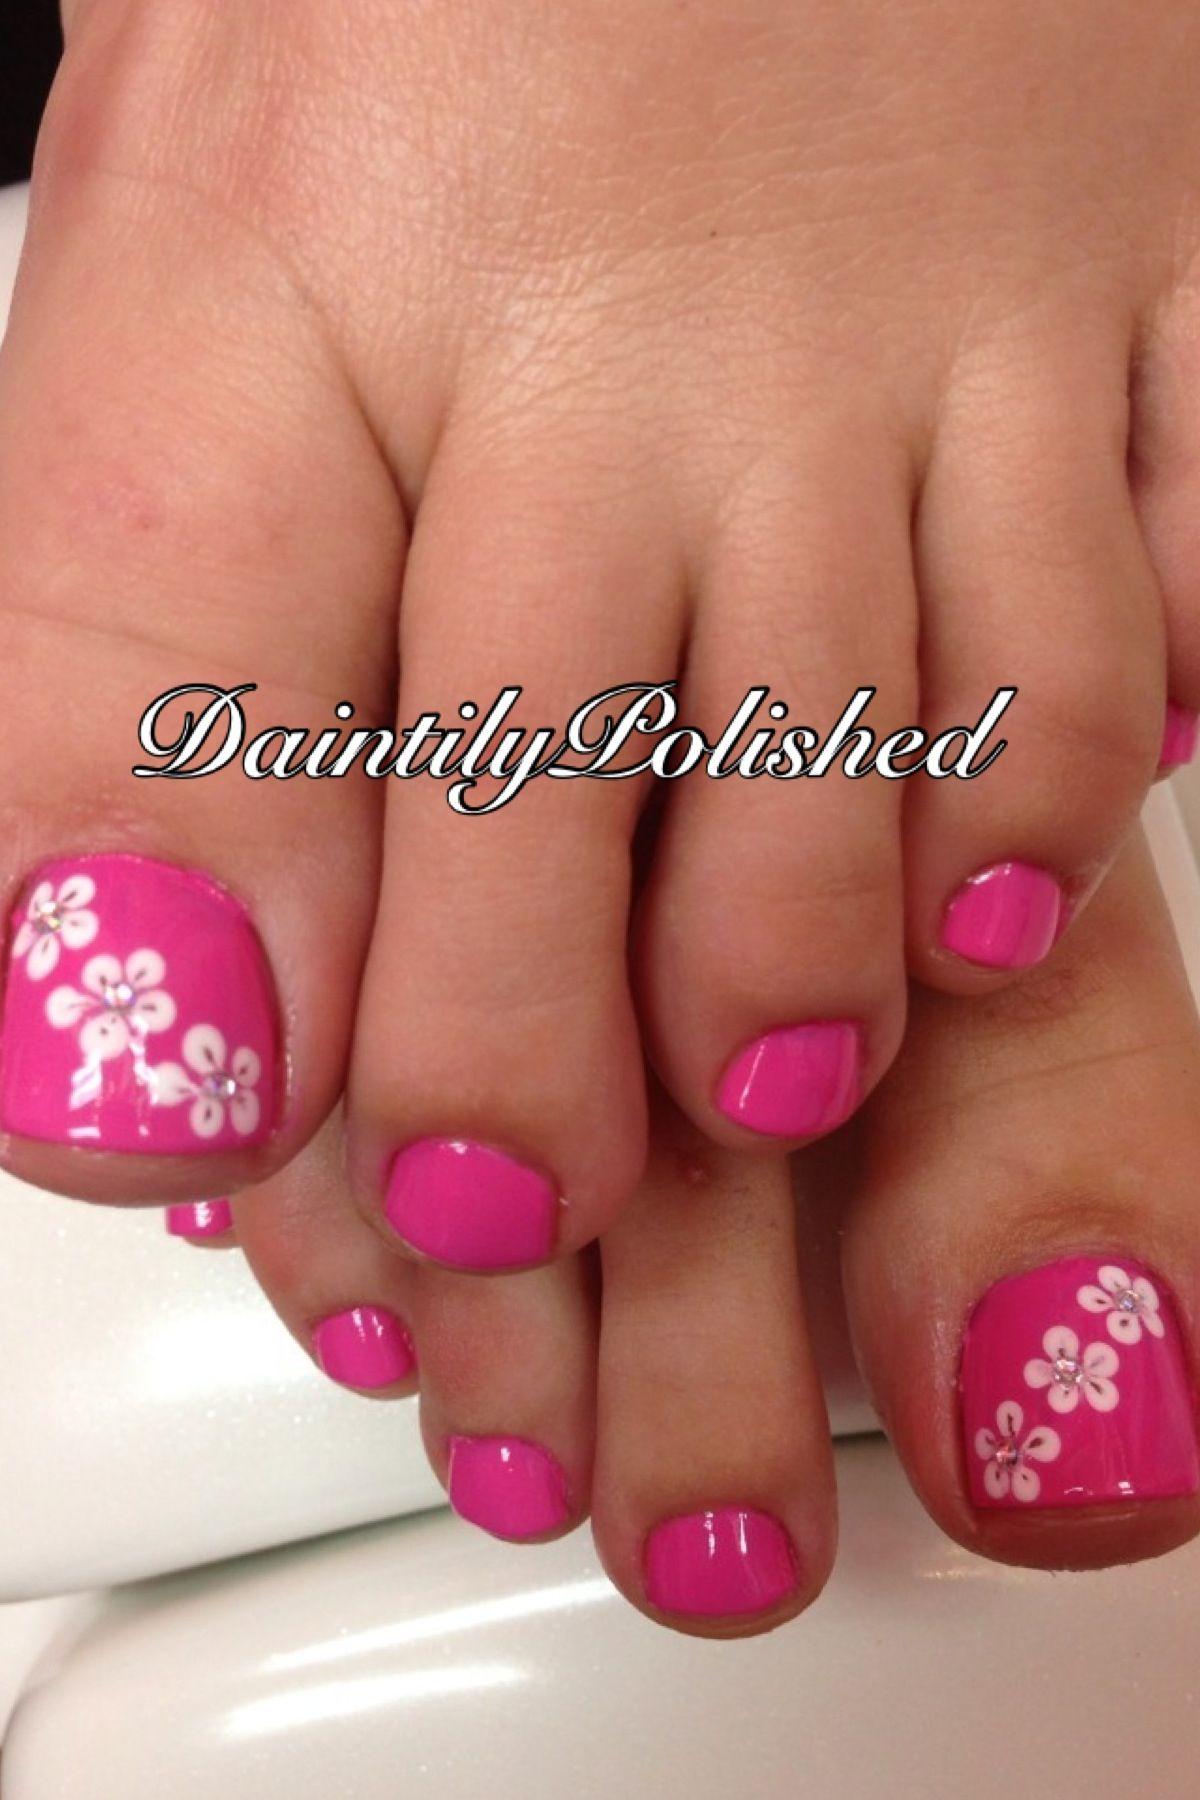 Toenails, Toe And Pedicures On Pinterest